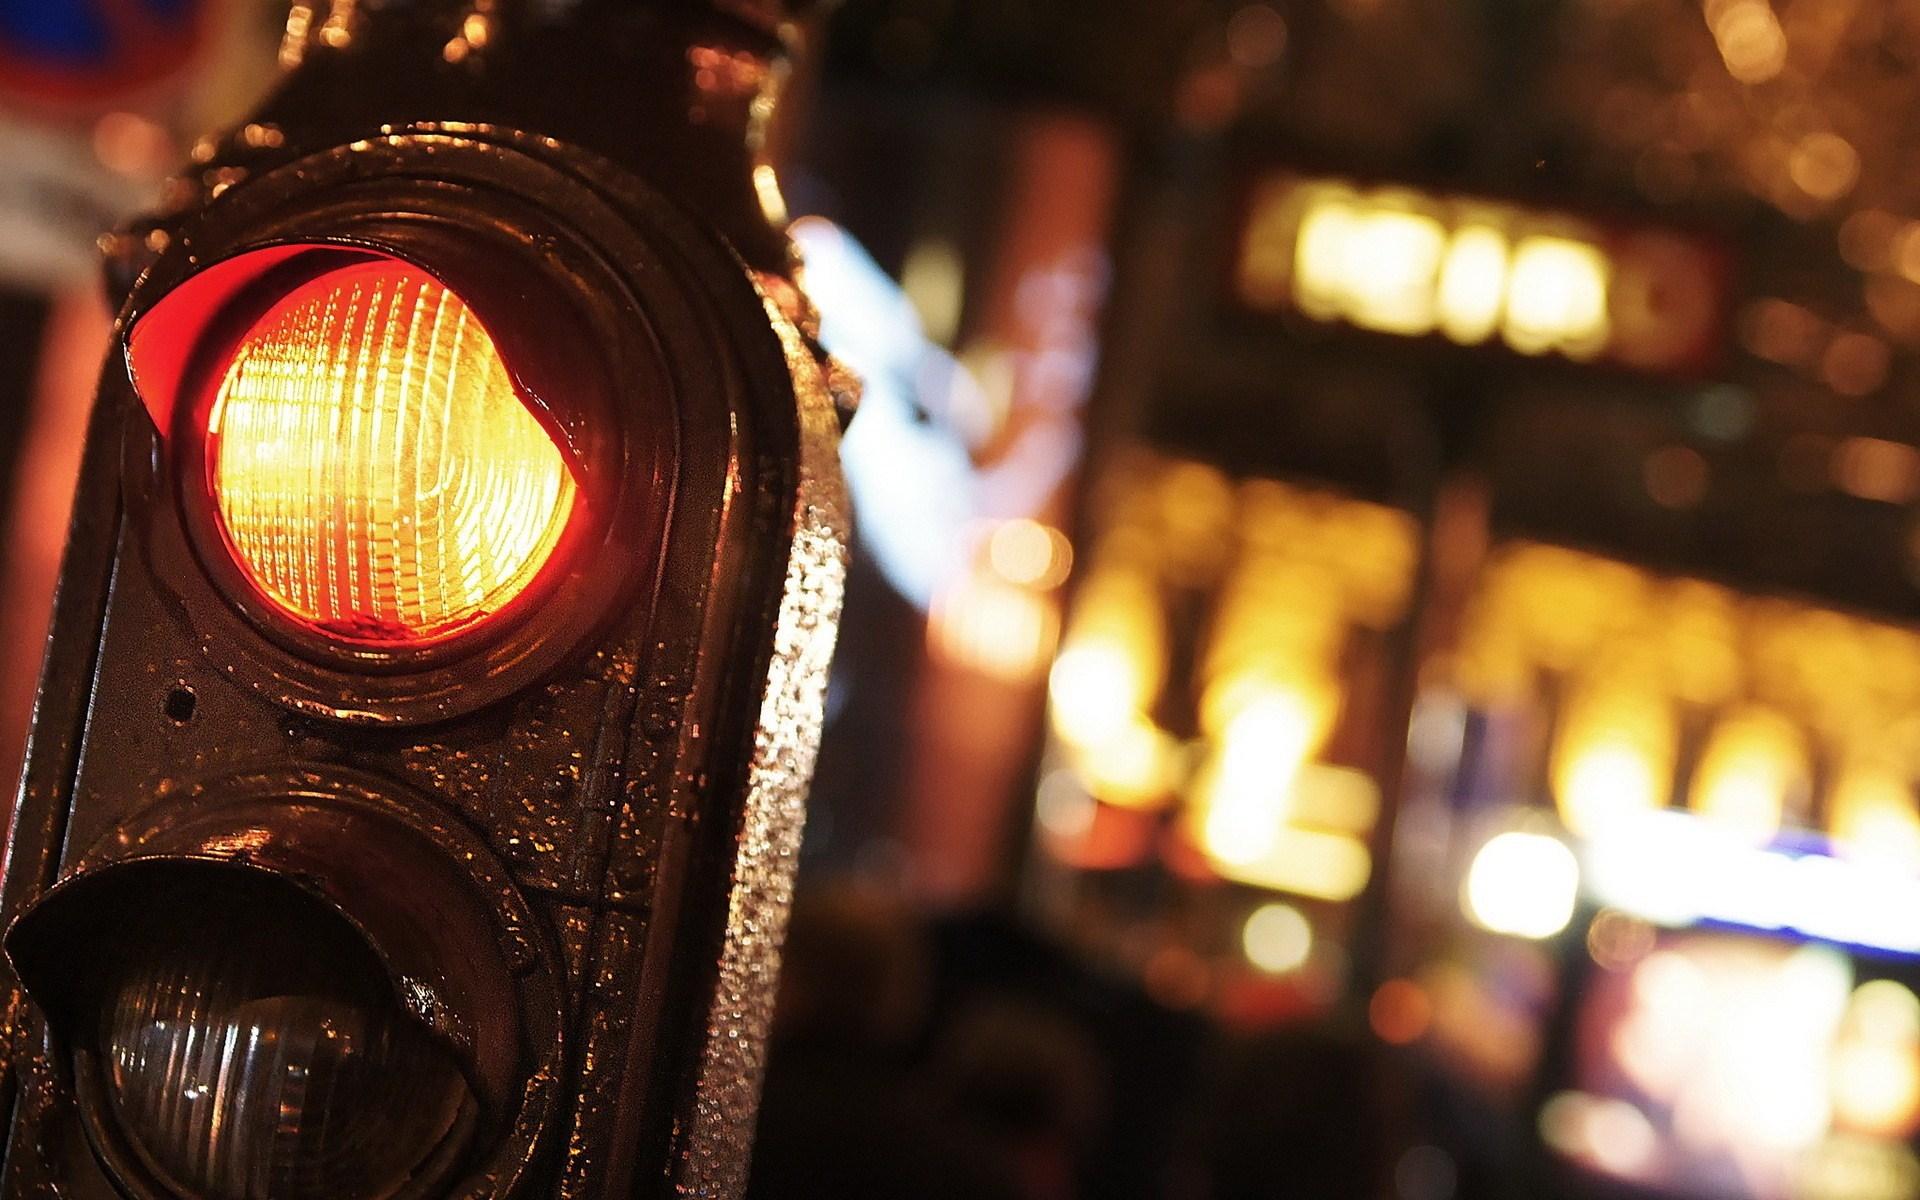 traffic-lights-night-city-close-up-photo